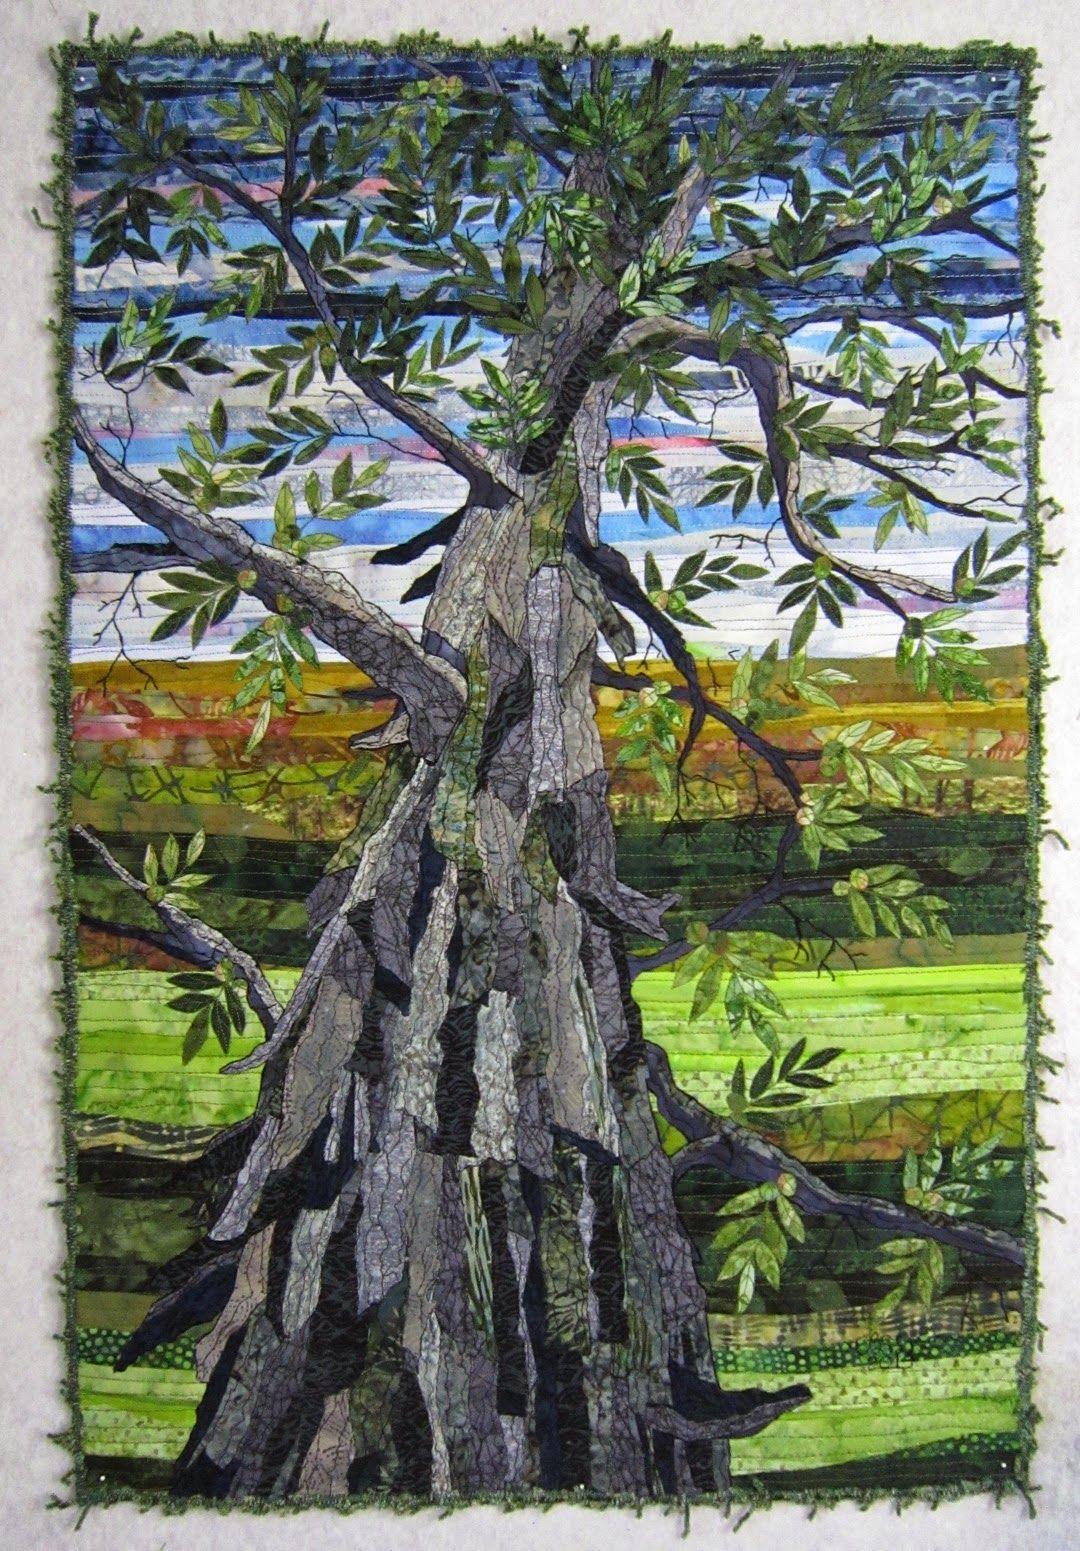 Barbara Strobel Lardon Art quilts: Nature - lots of great quilts ... : great quilts - Adamdwight.com